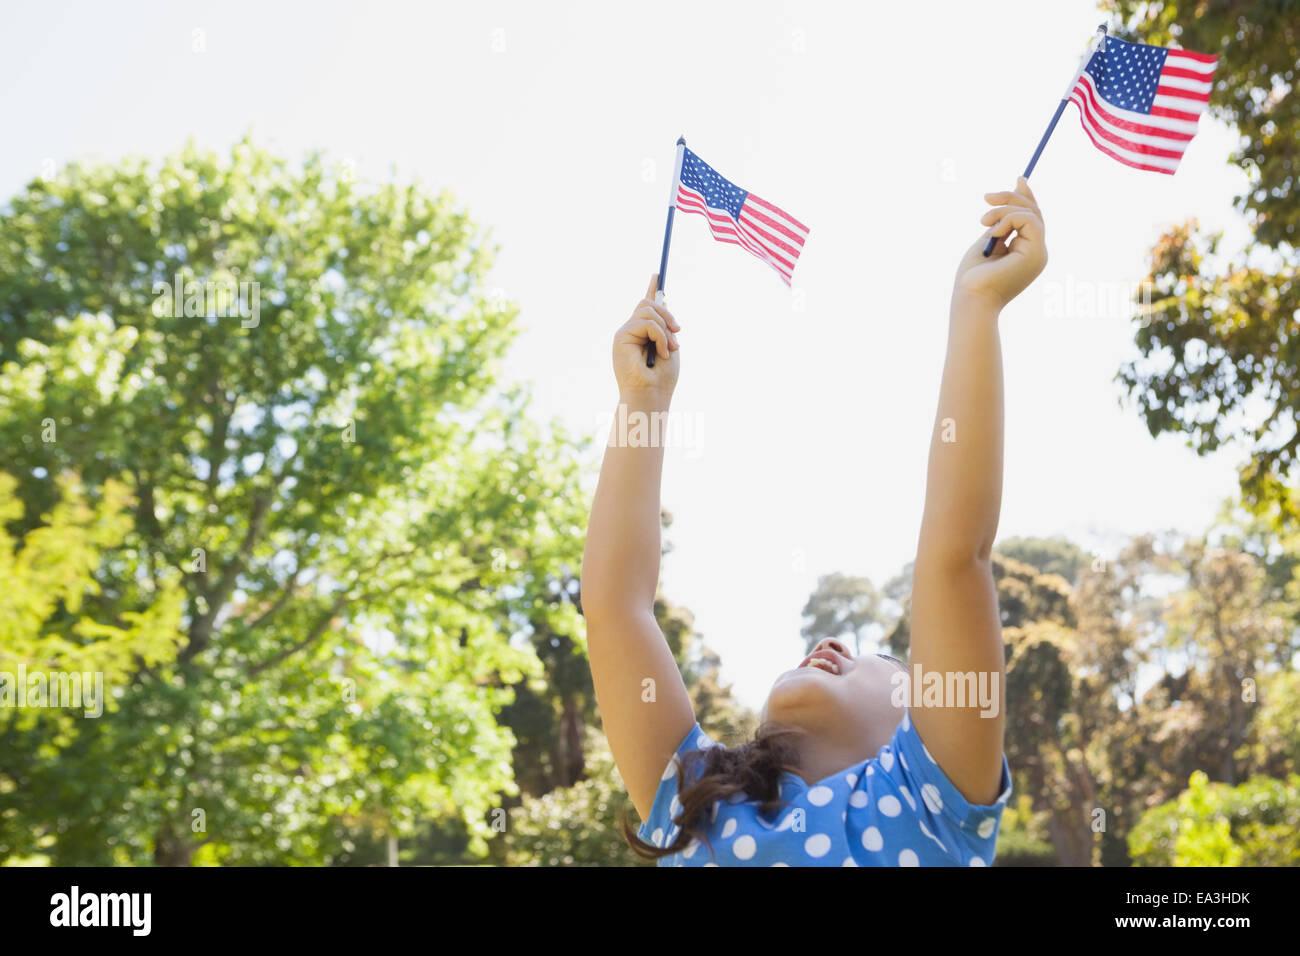 Mädchen hält zwei amerikanische Flaggen im park Stockbild